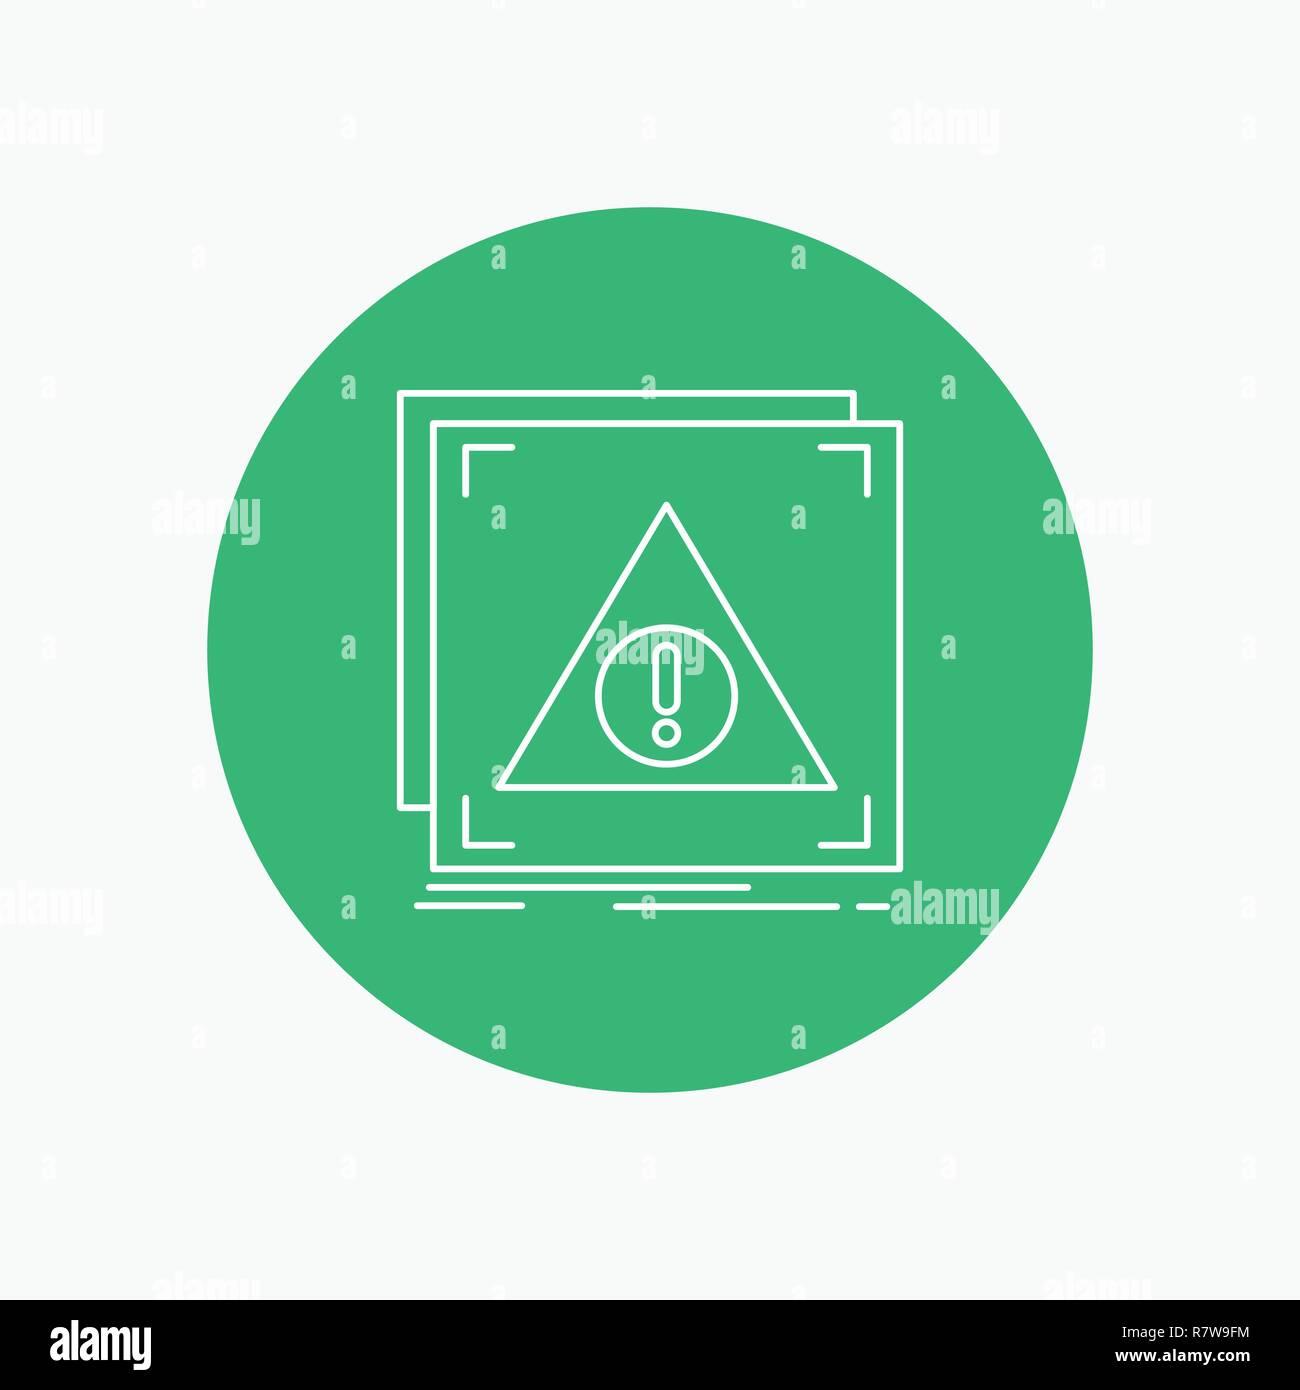 Error, Application, Denied, server, alert White Line Icon in Circle background. vector icon illustration - Stock Image